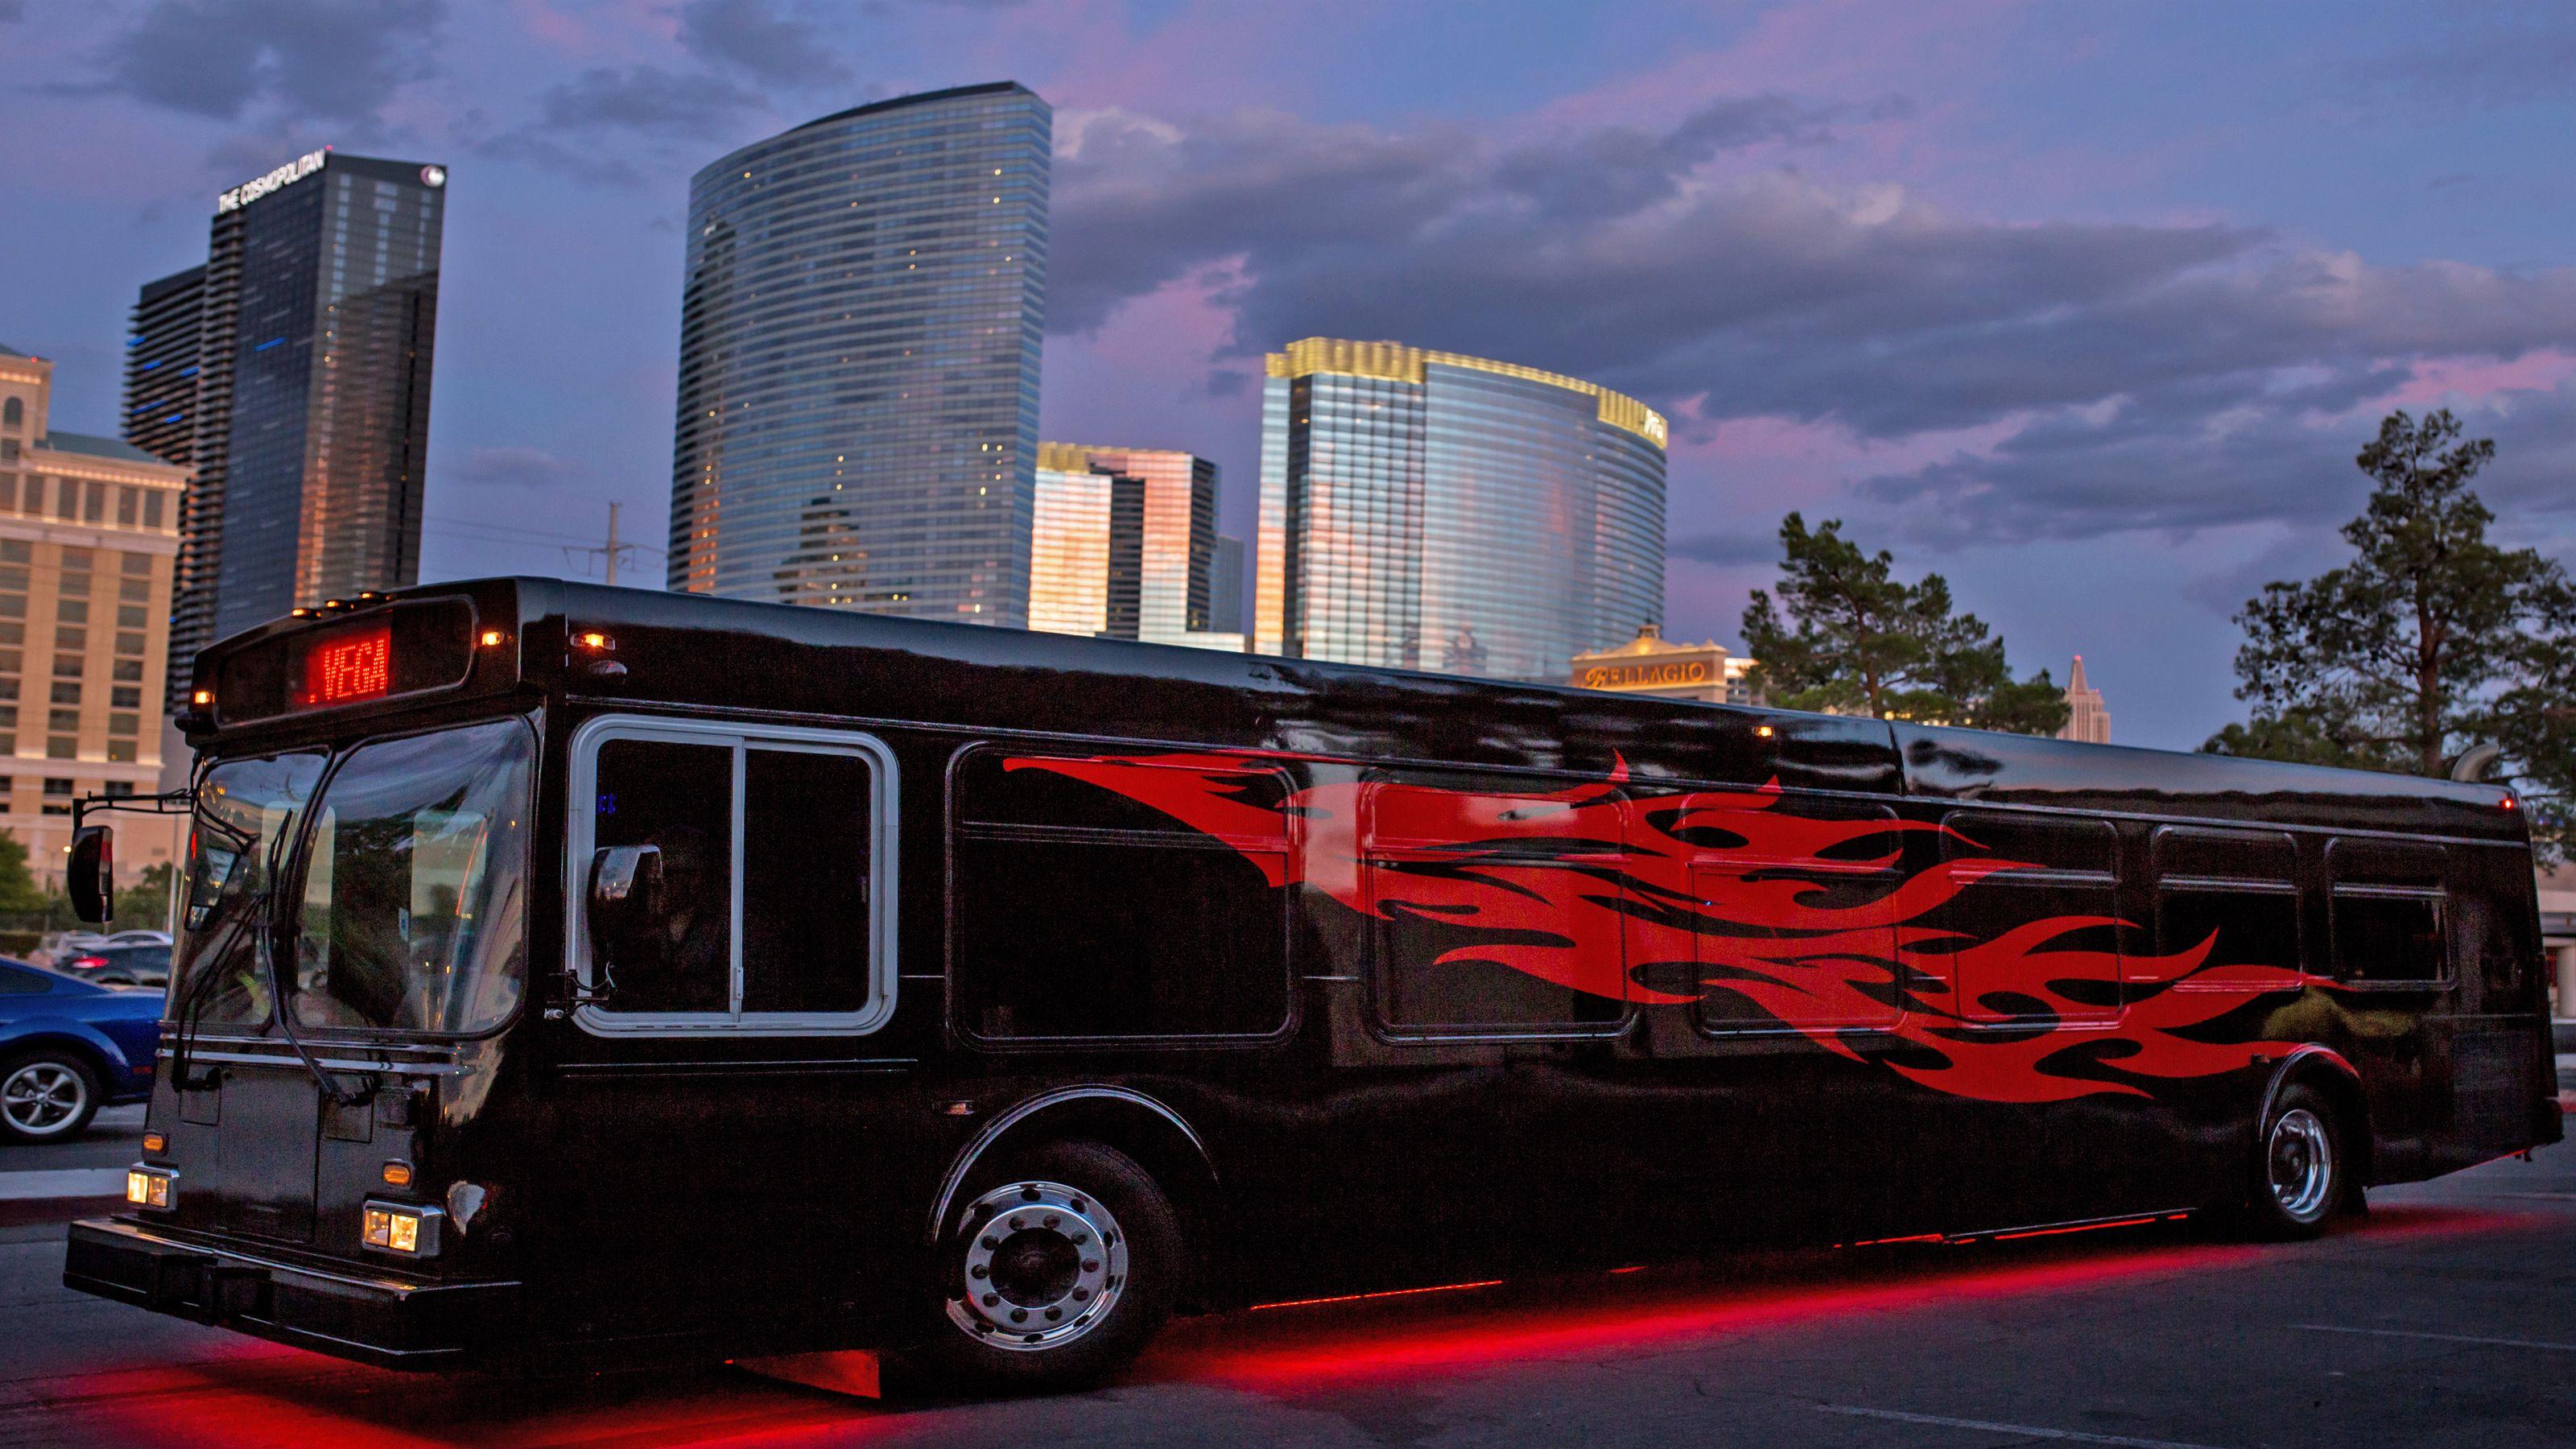 4 Nightclub Crawl with Live DJ Party Bus & Unlimited Drinks